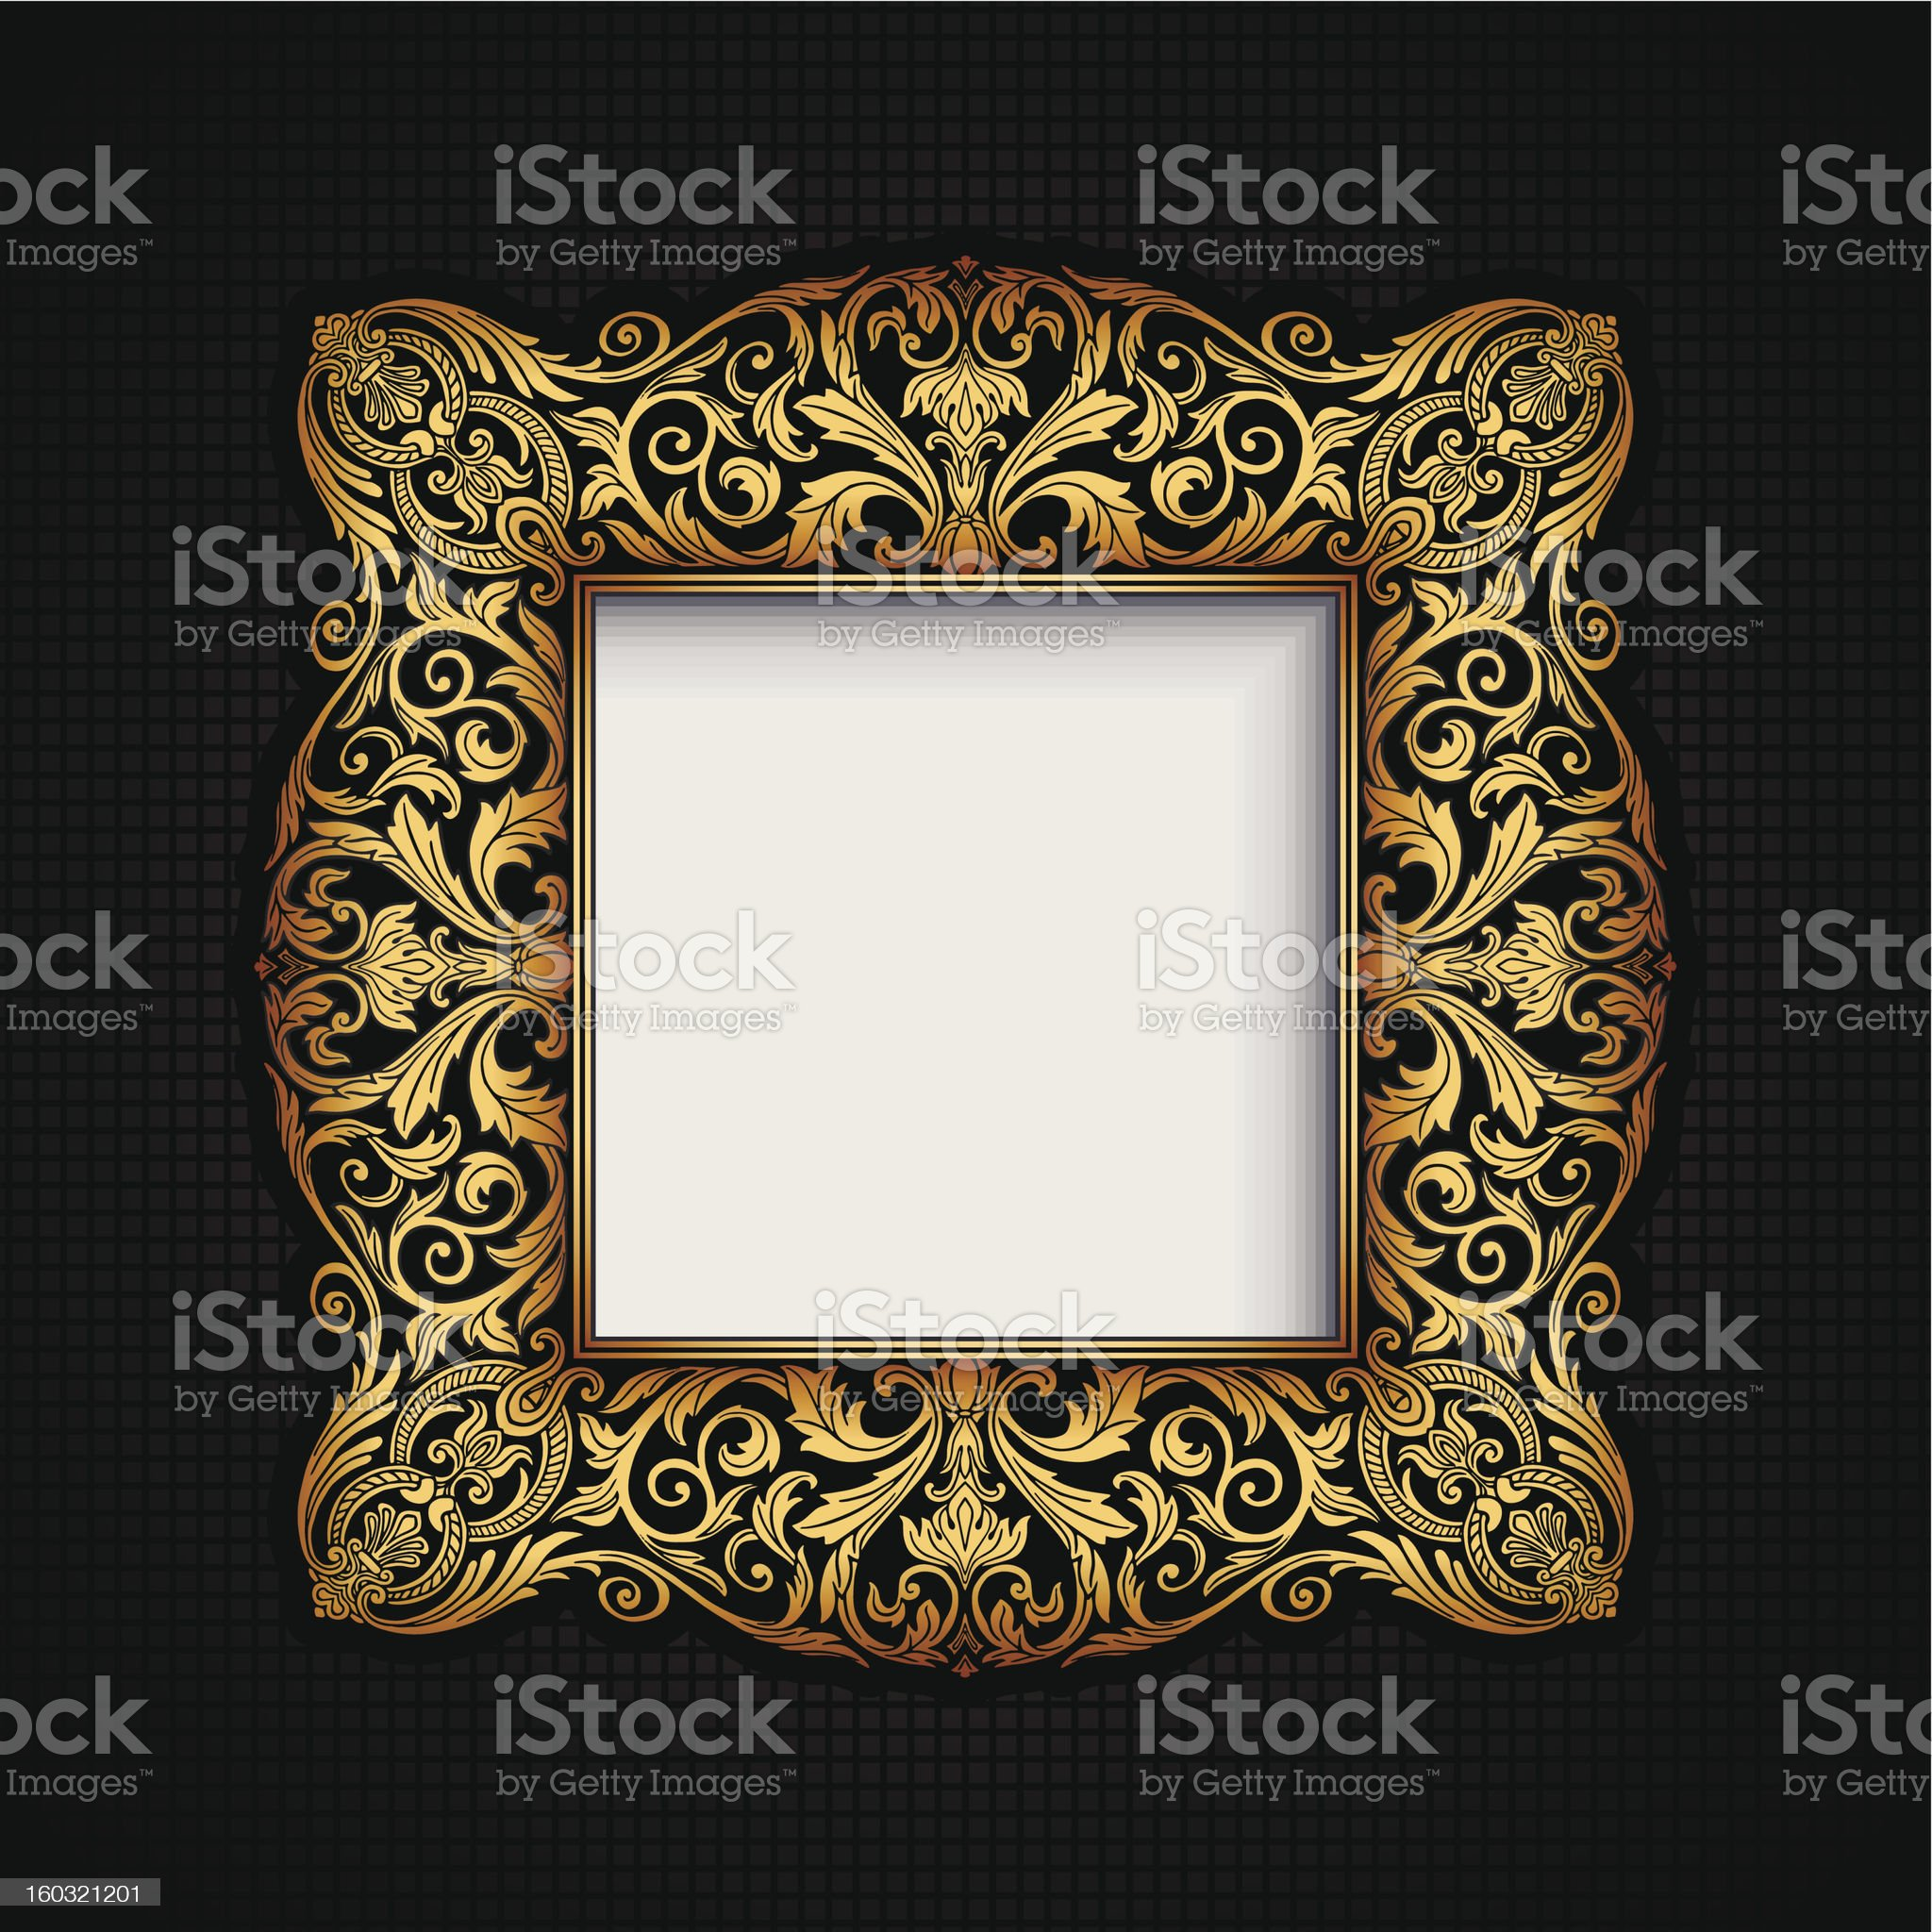 Vintage ornamental frame royalty-free stock photo